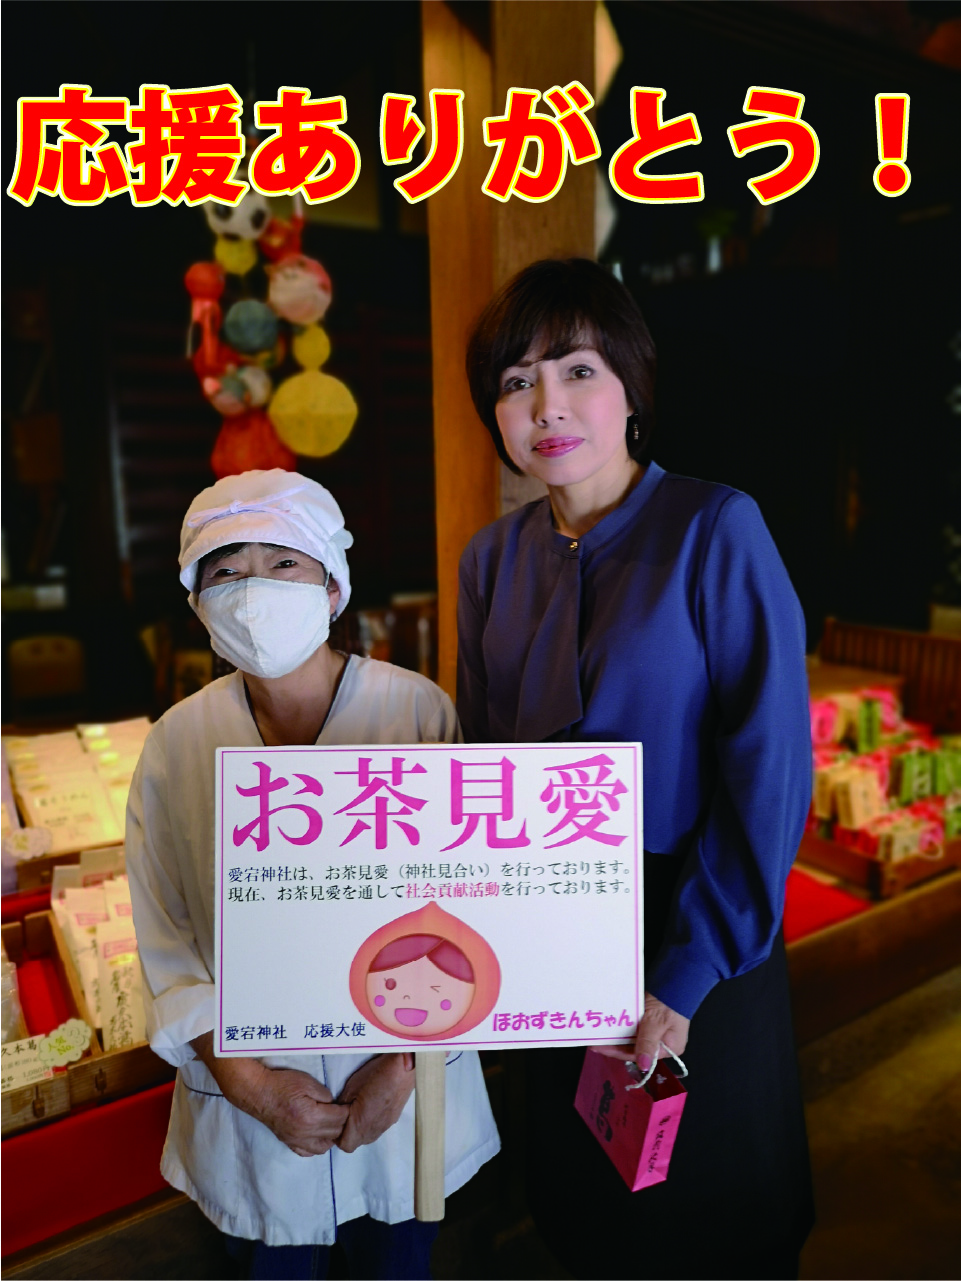 fukuoka-lp2_20210527_3-art-7-80